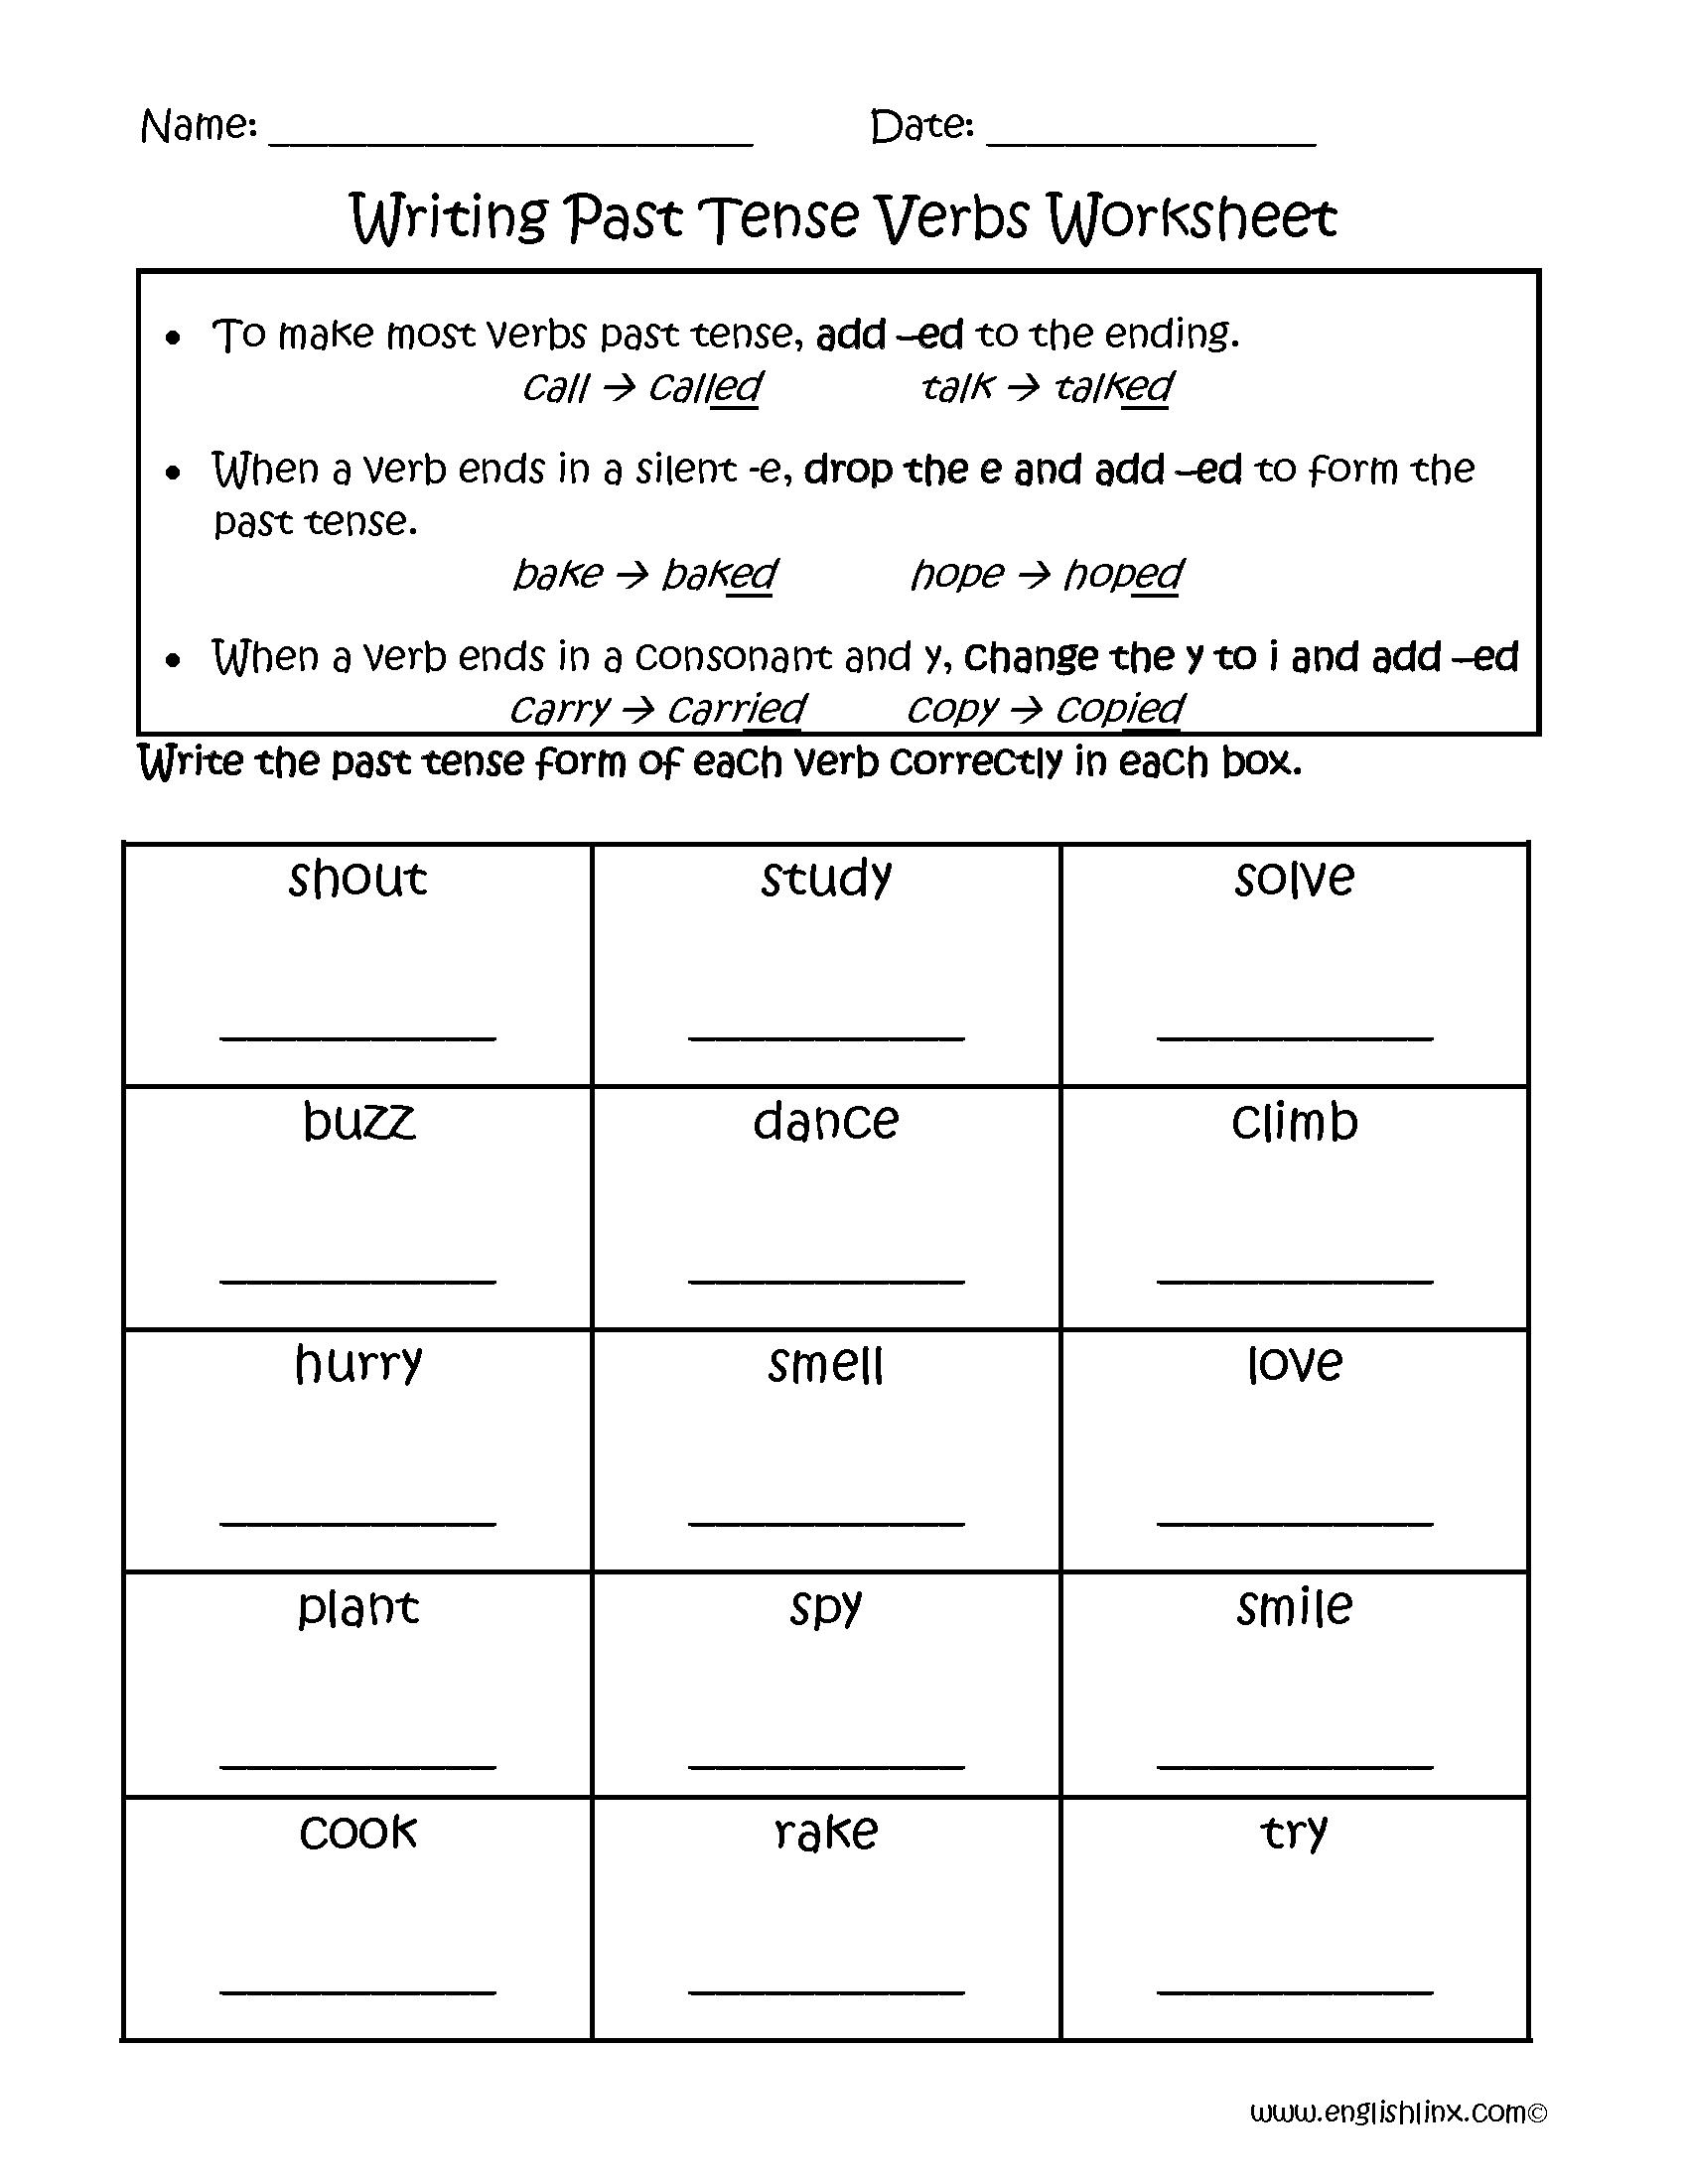 medium resolution of Verbs Worksheets   Verb Tenses Worksheets   Verb worksheets